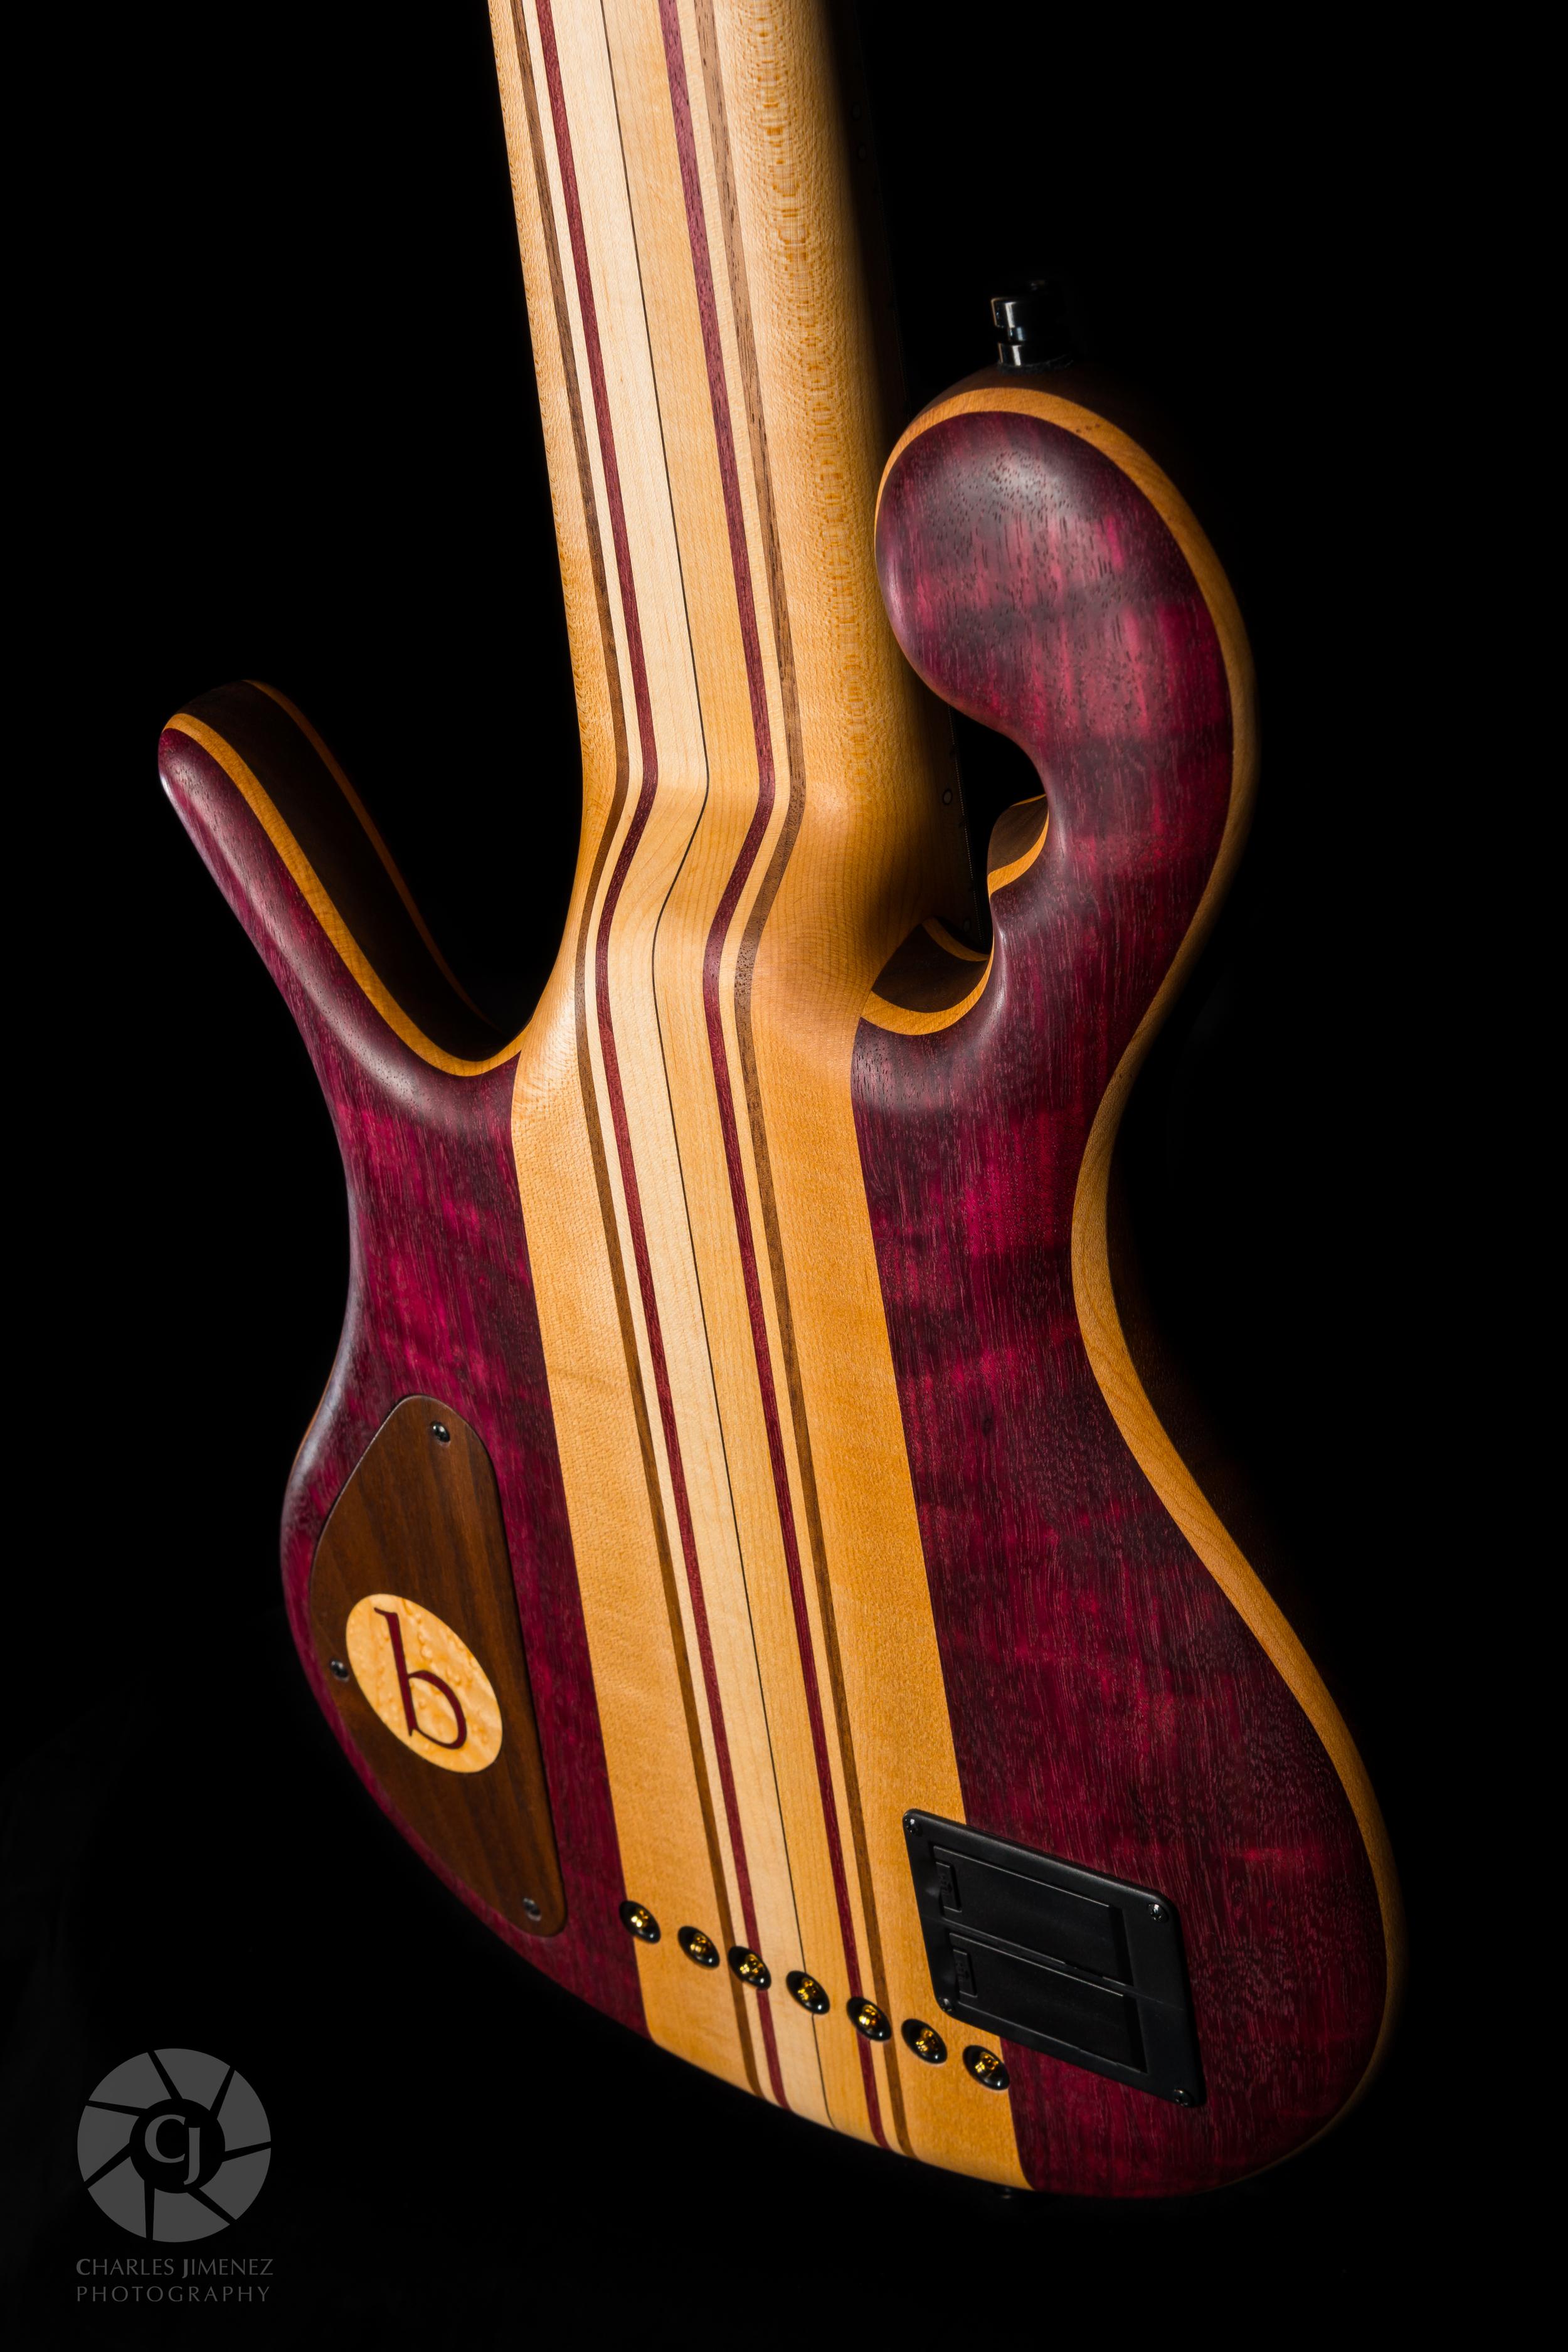 BMT Guitars_Grimace_January 05 2014_10.jpg